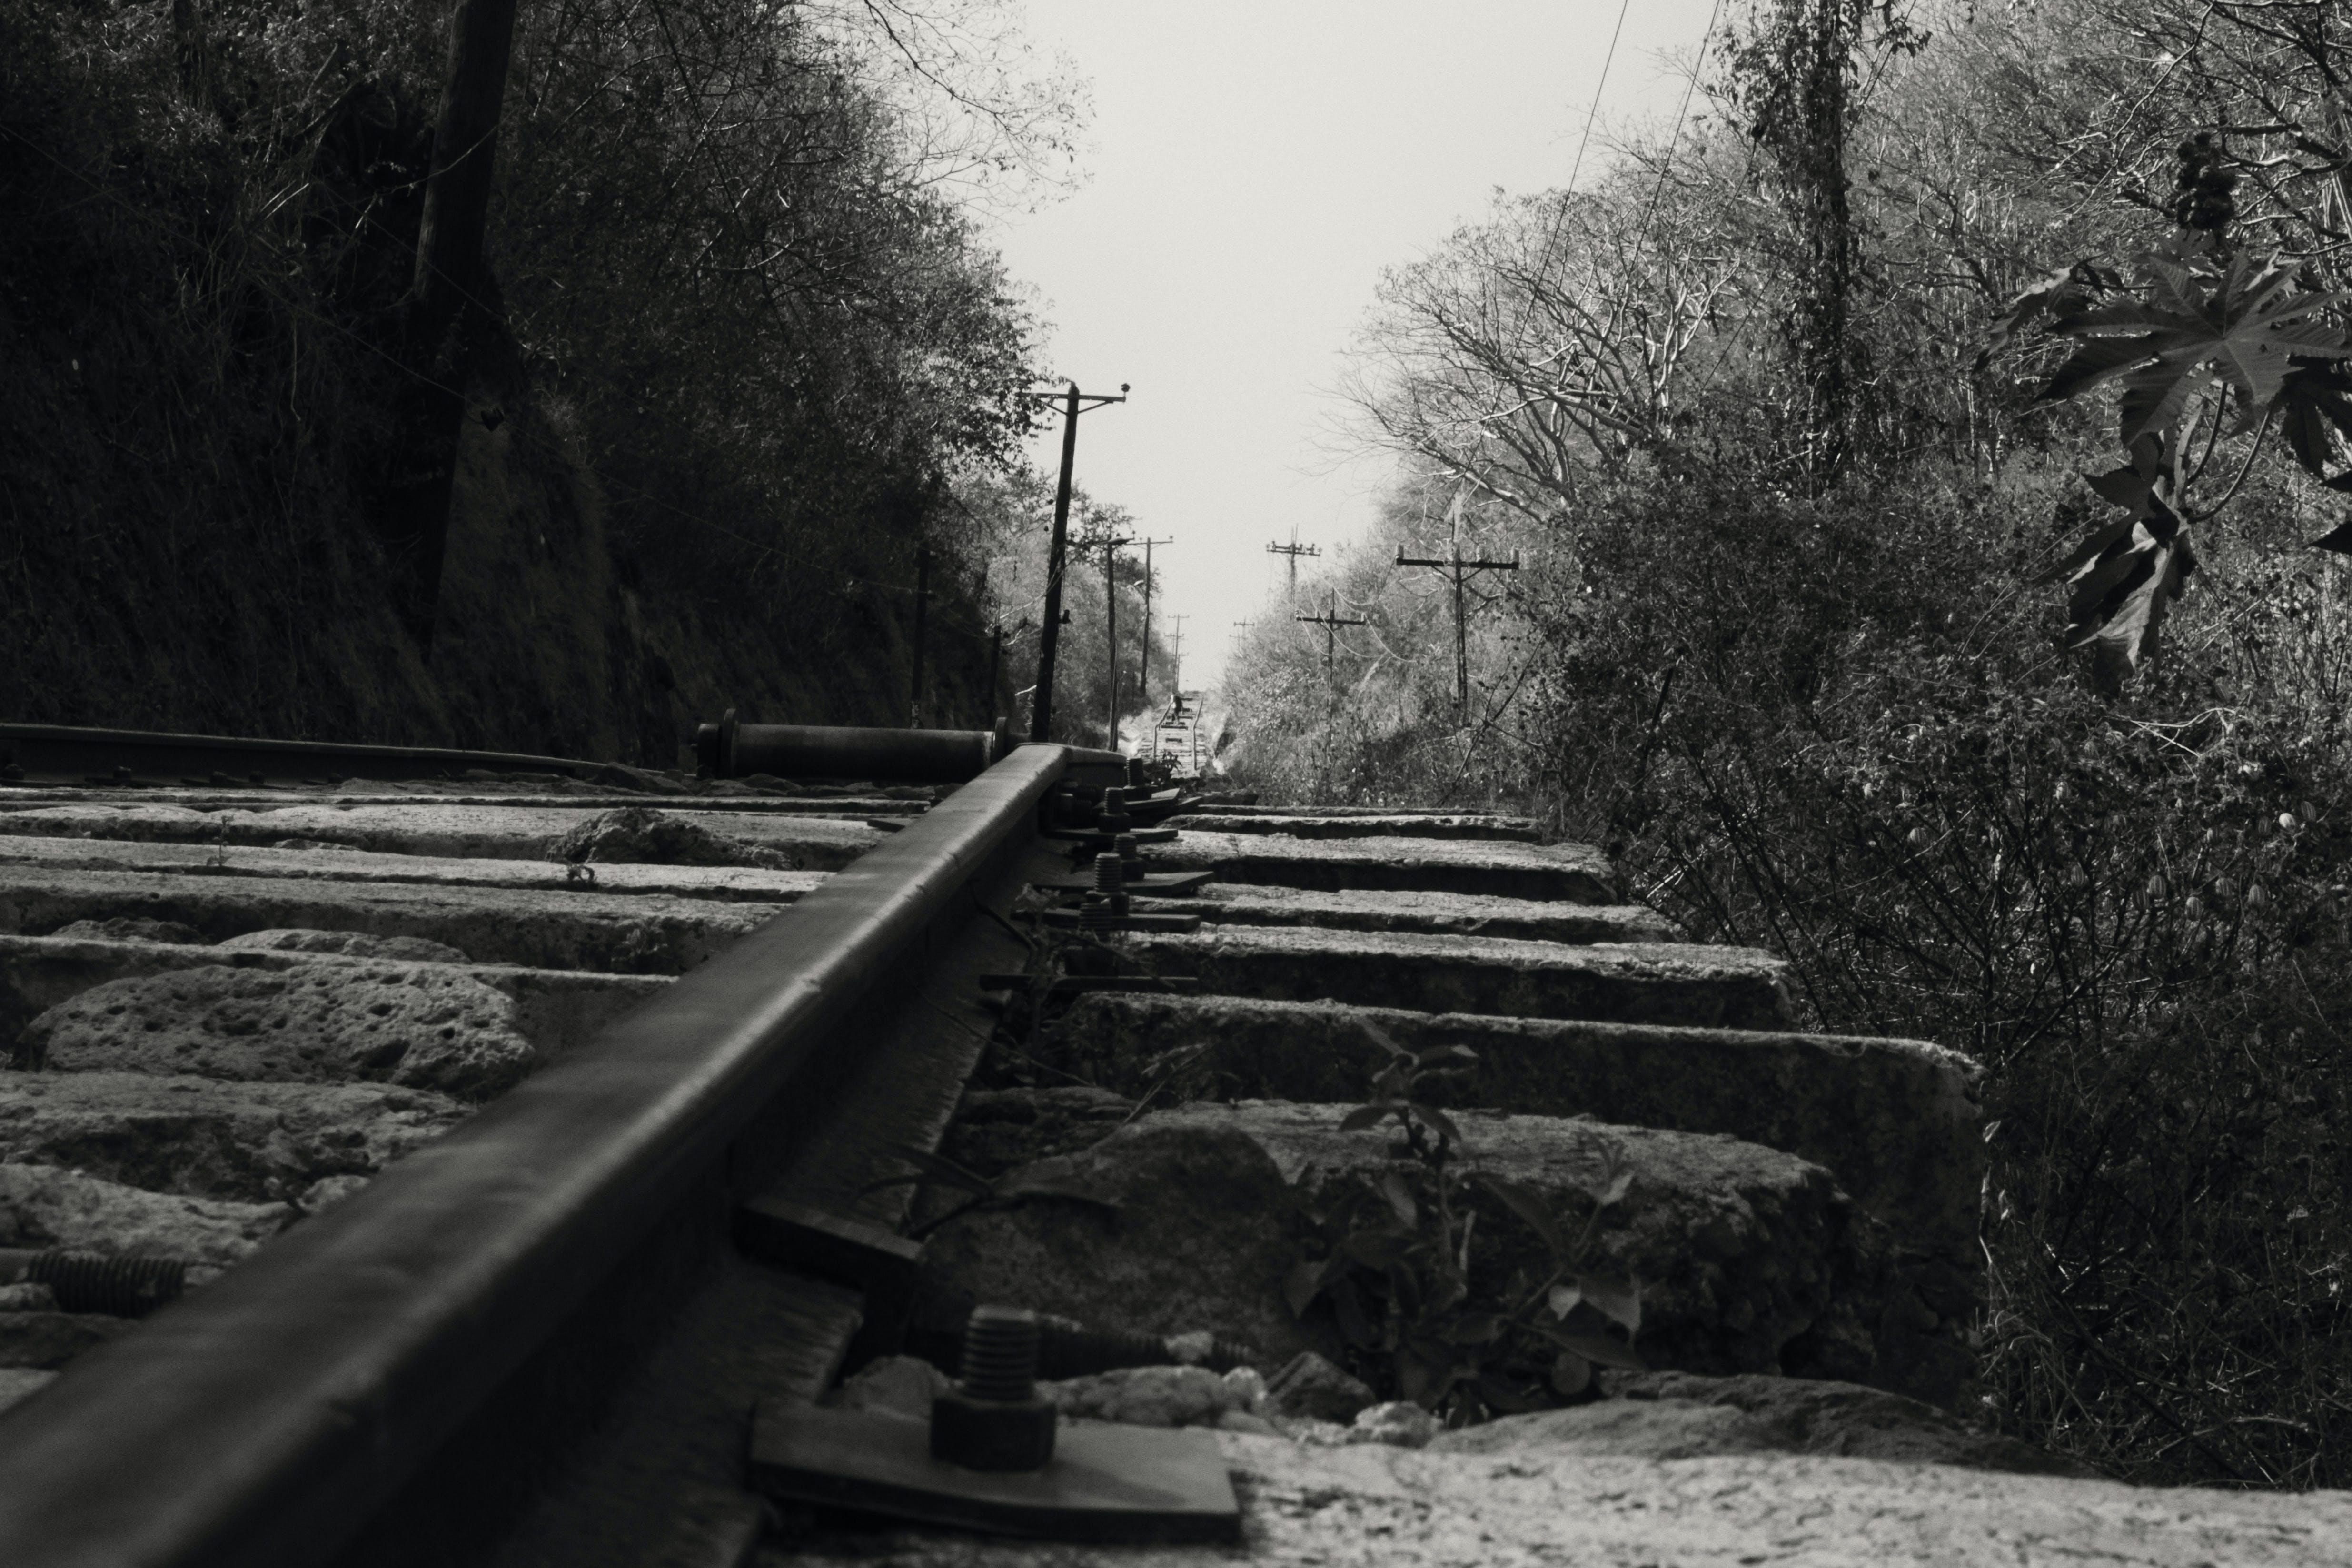 Free stock photo of black and white, path, paths, railway